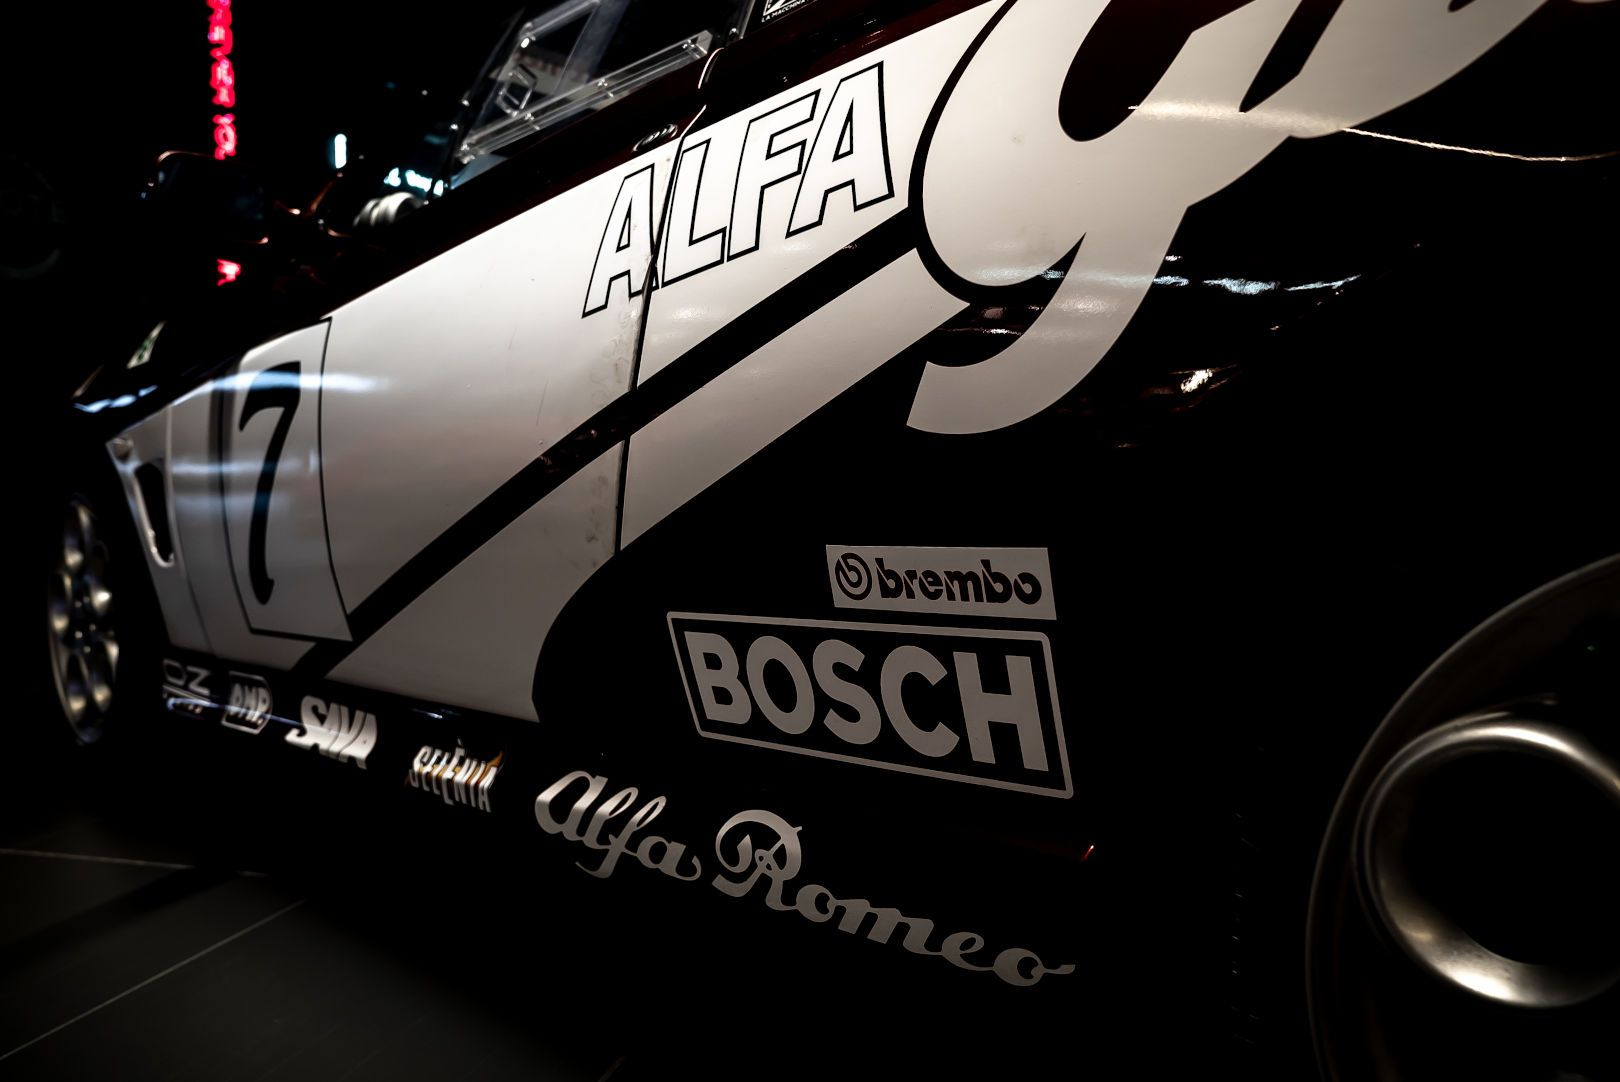 1995 Alfa Romeo GTV 2.0 V6 Turbo Cup Replica 57183